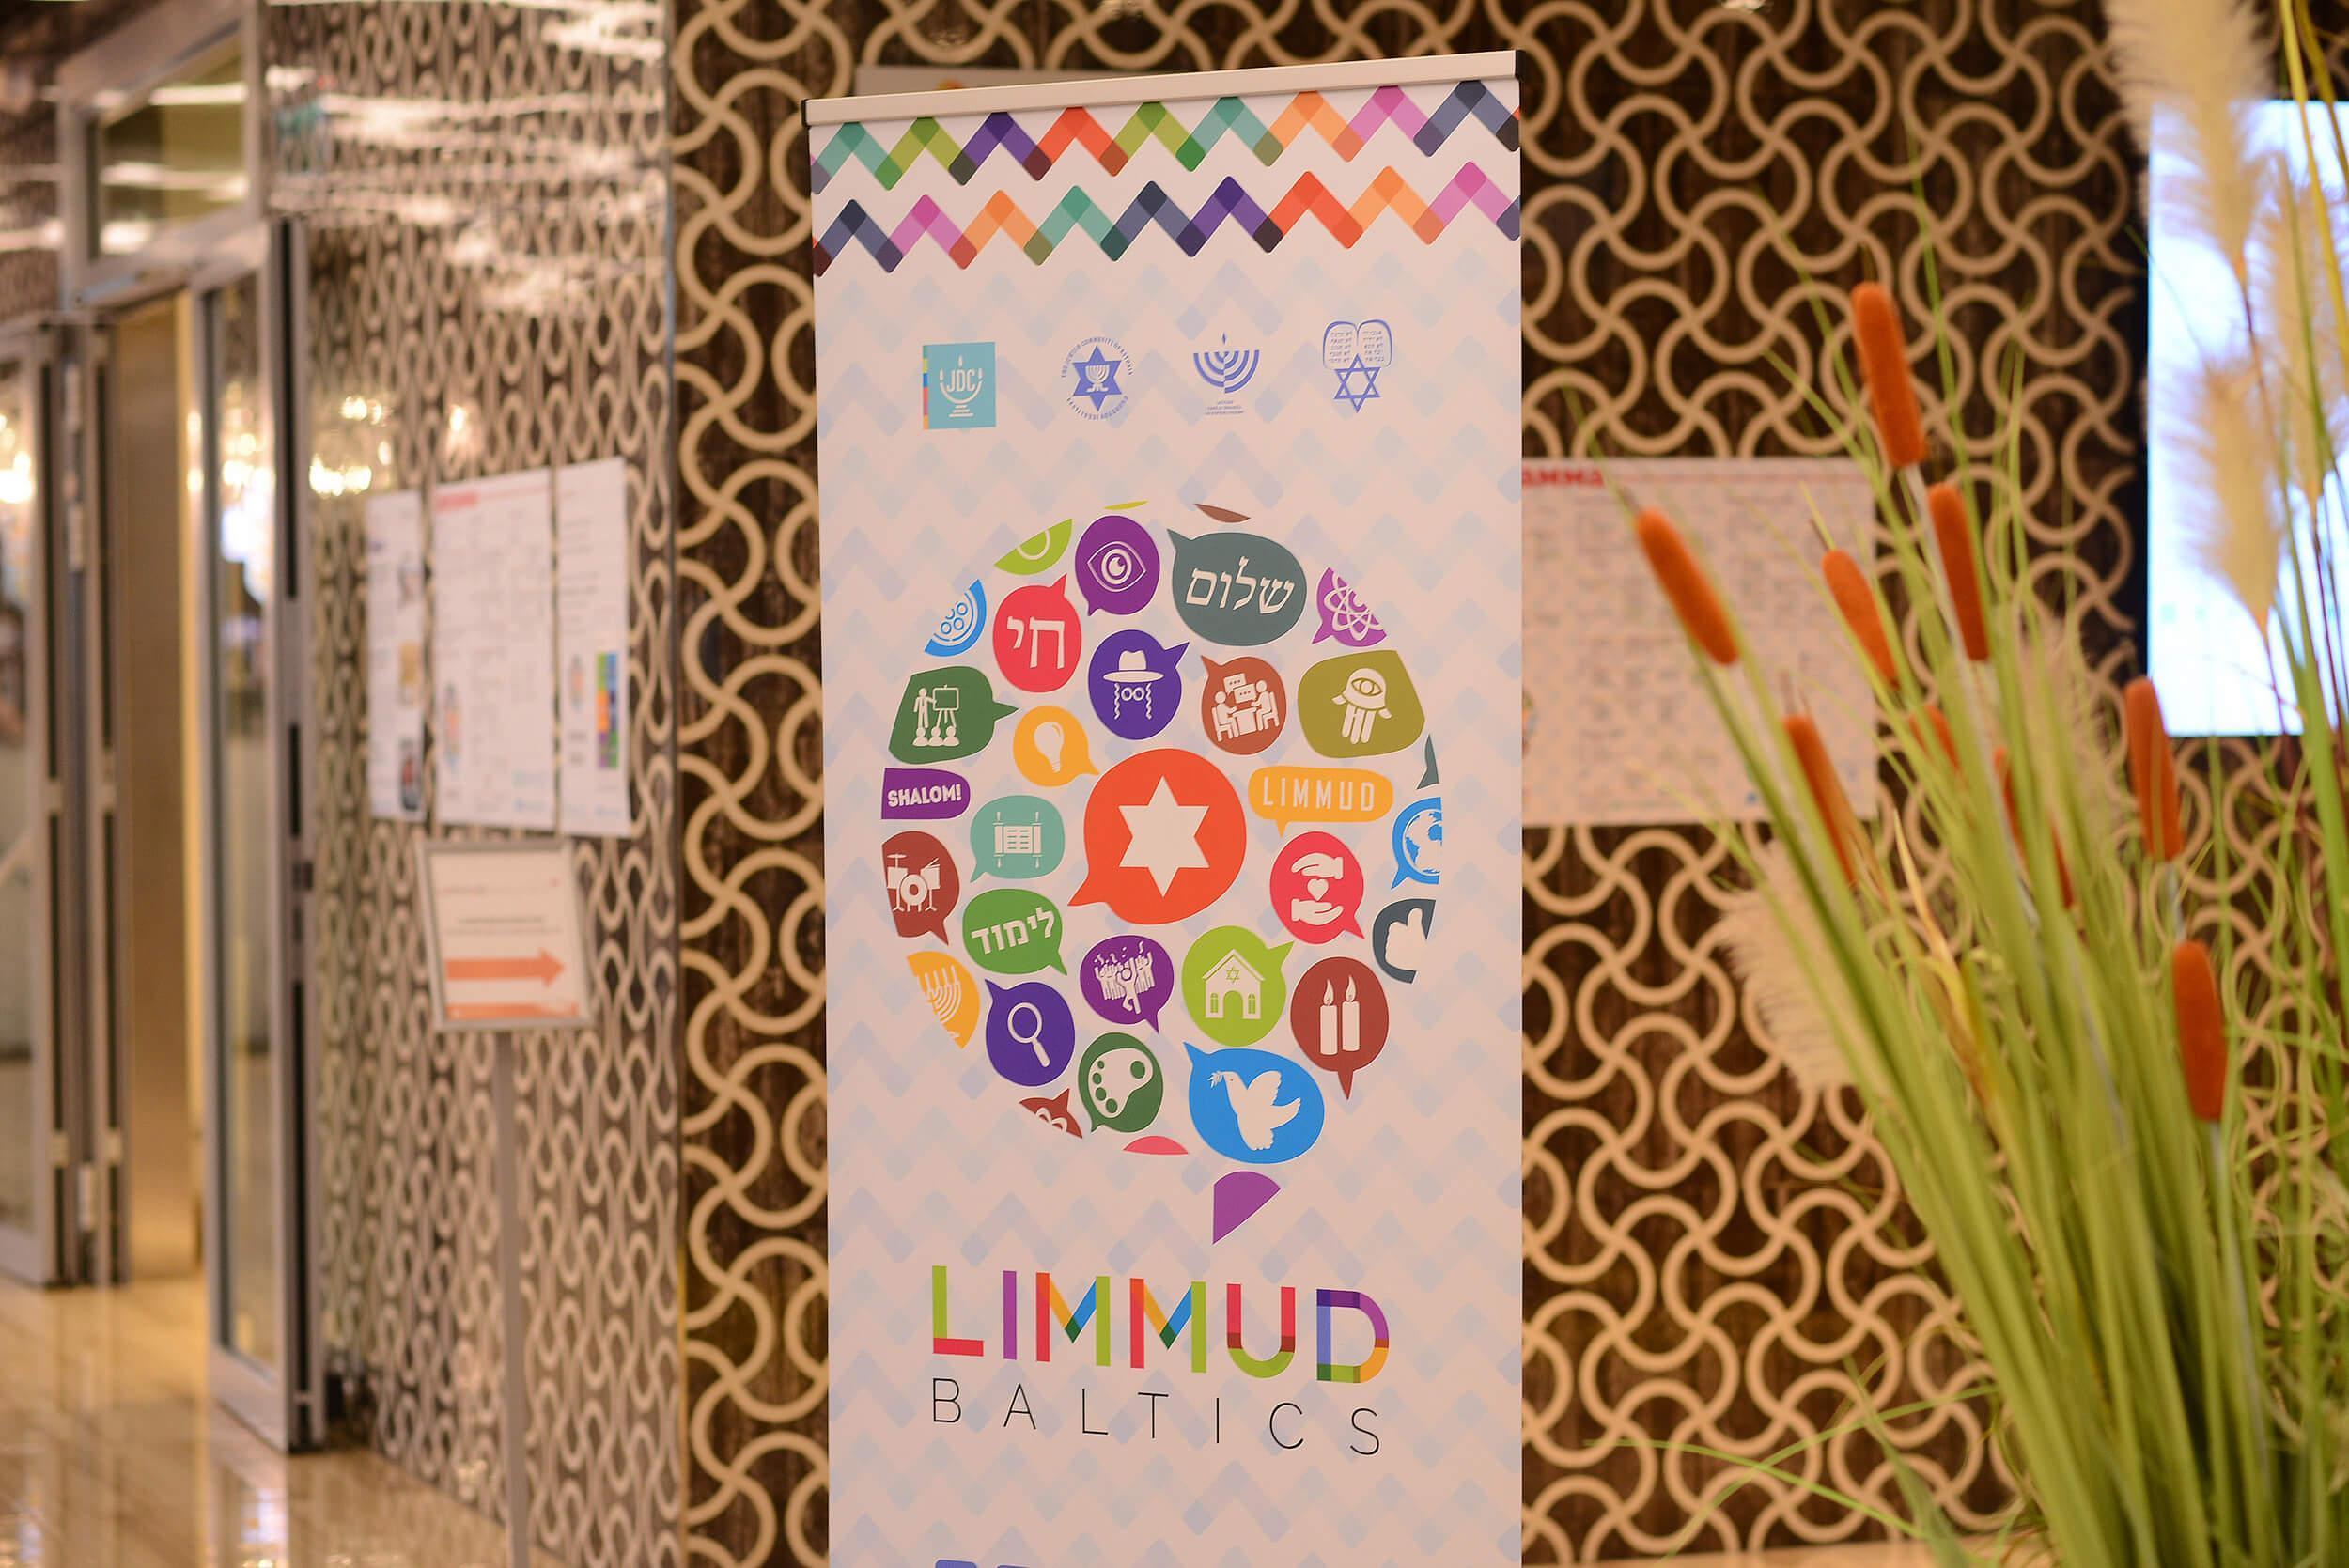 Thumbnail for: В Юрмале прошел Limmud Baltics